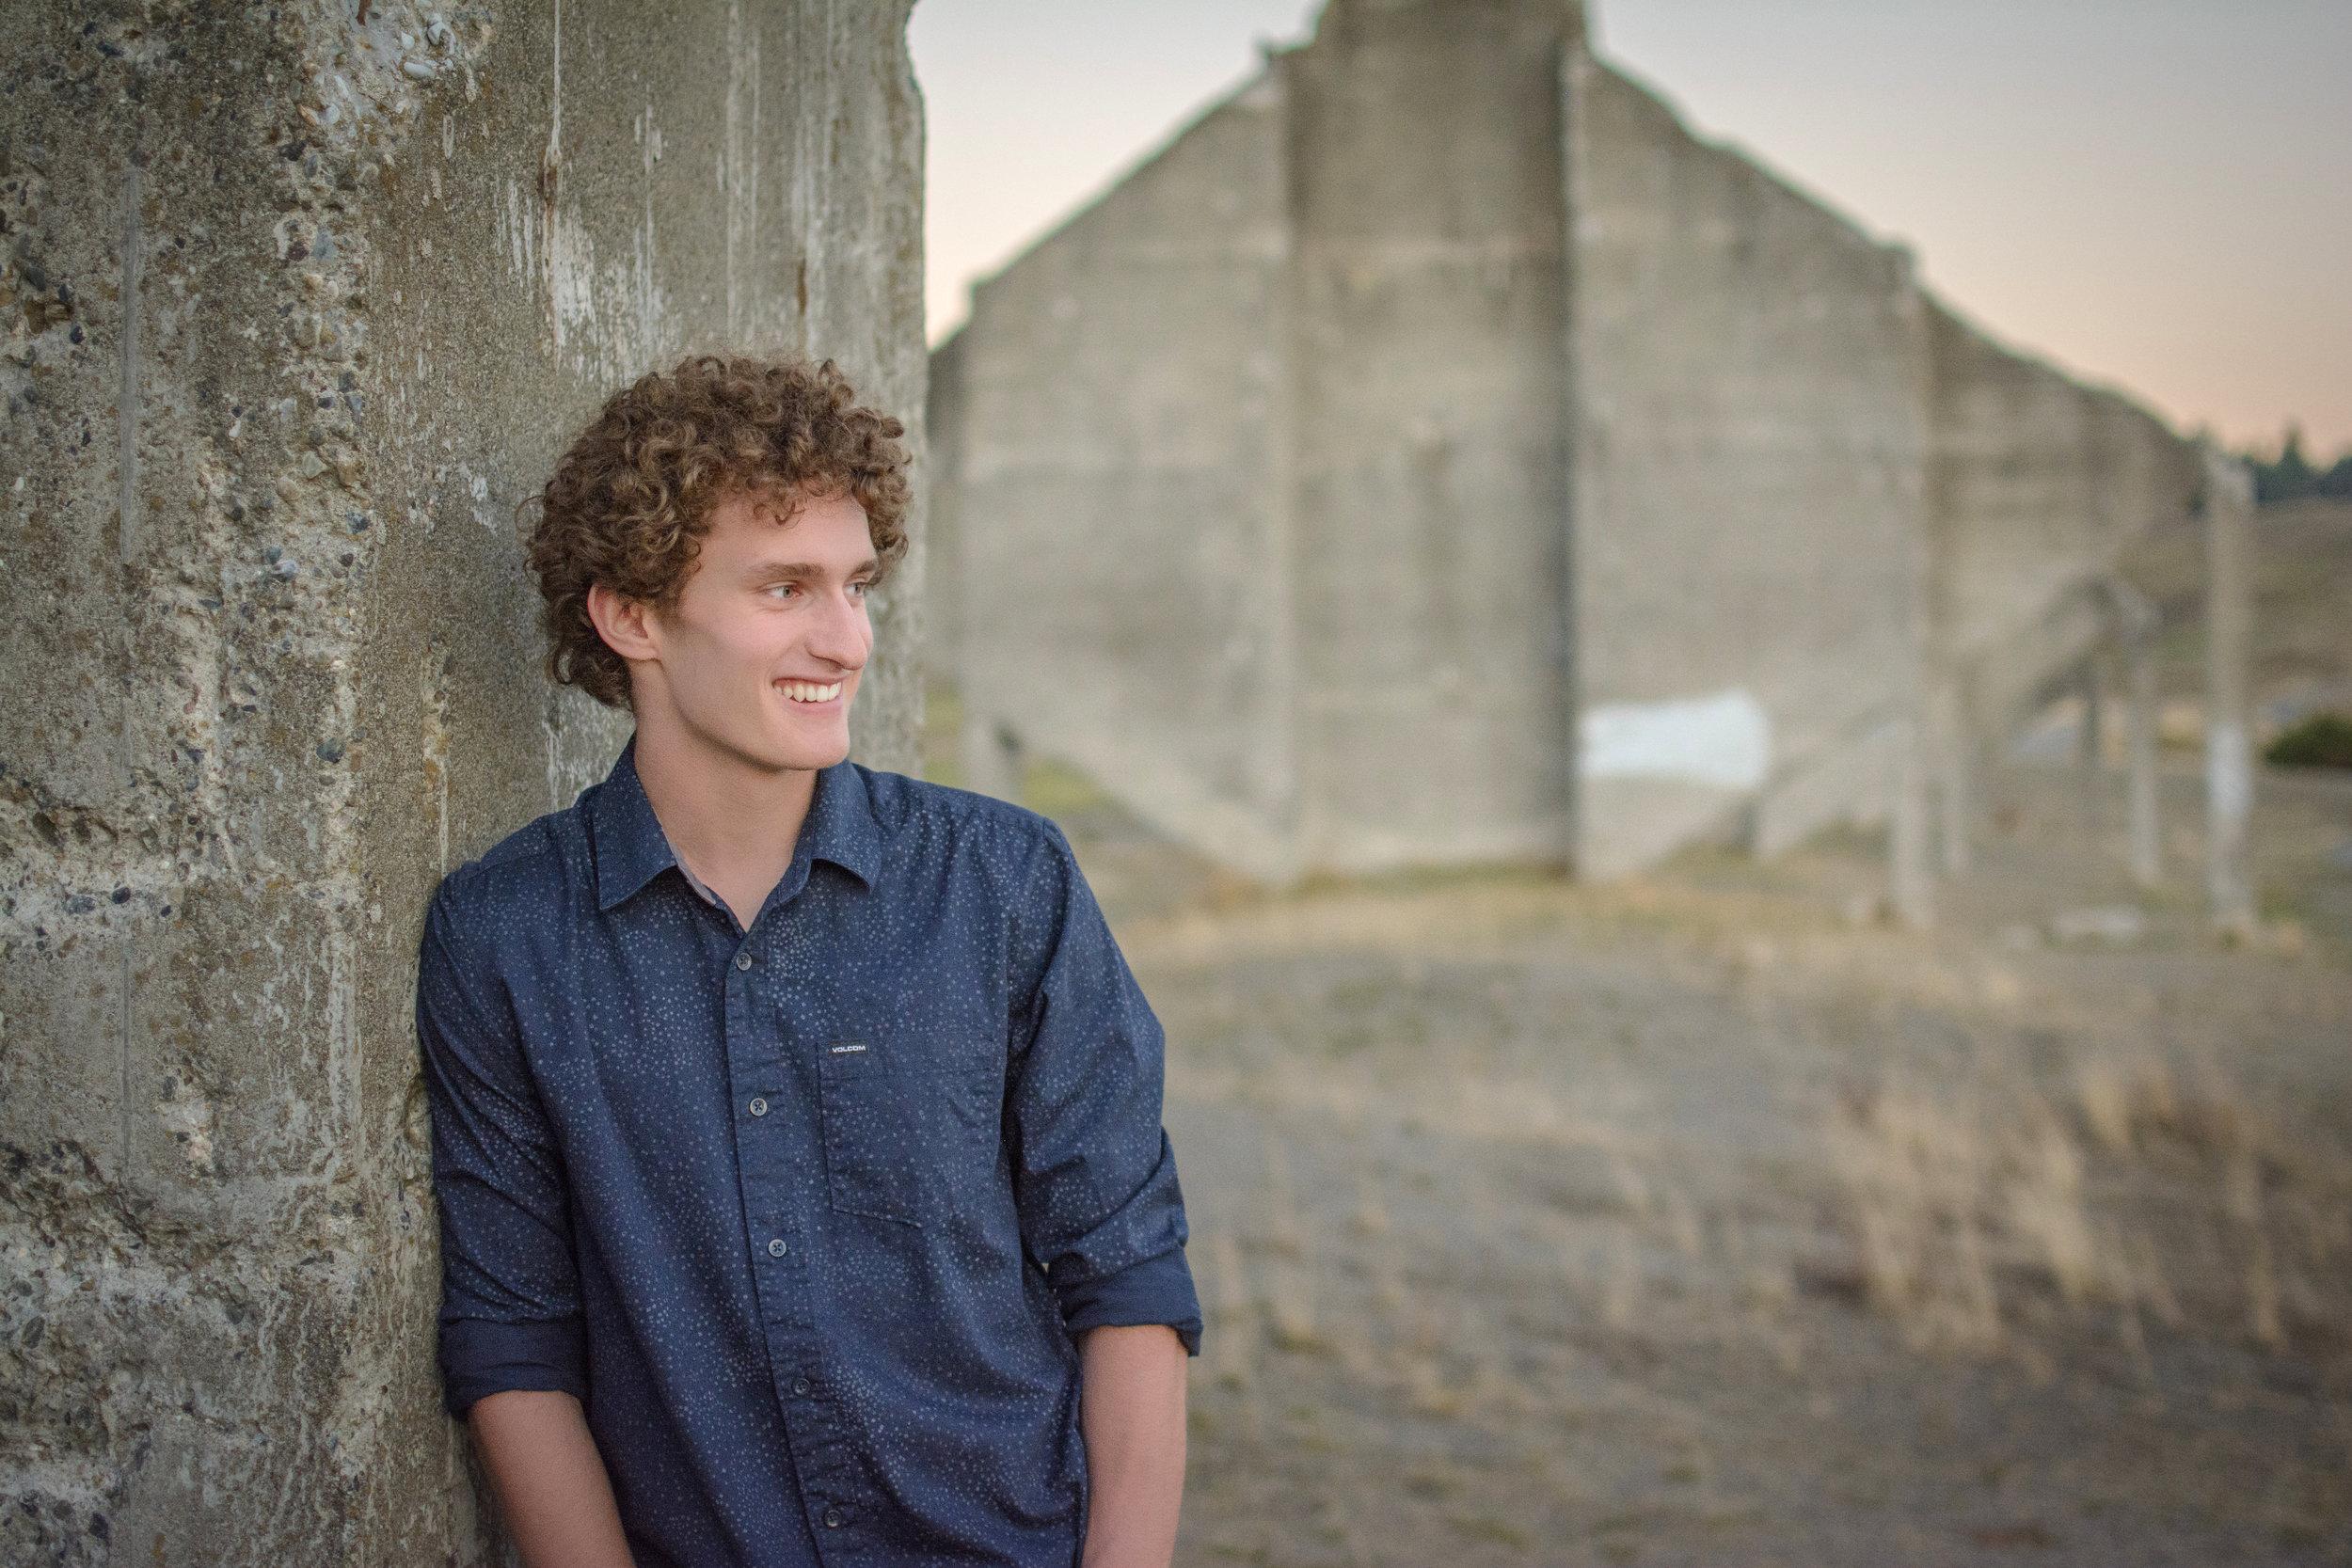 Alex Beloate - Senior Photo - Chambers Bay - Tacoma